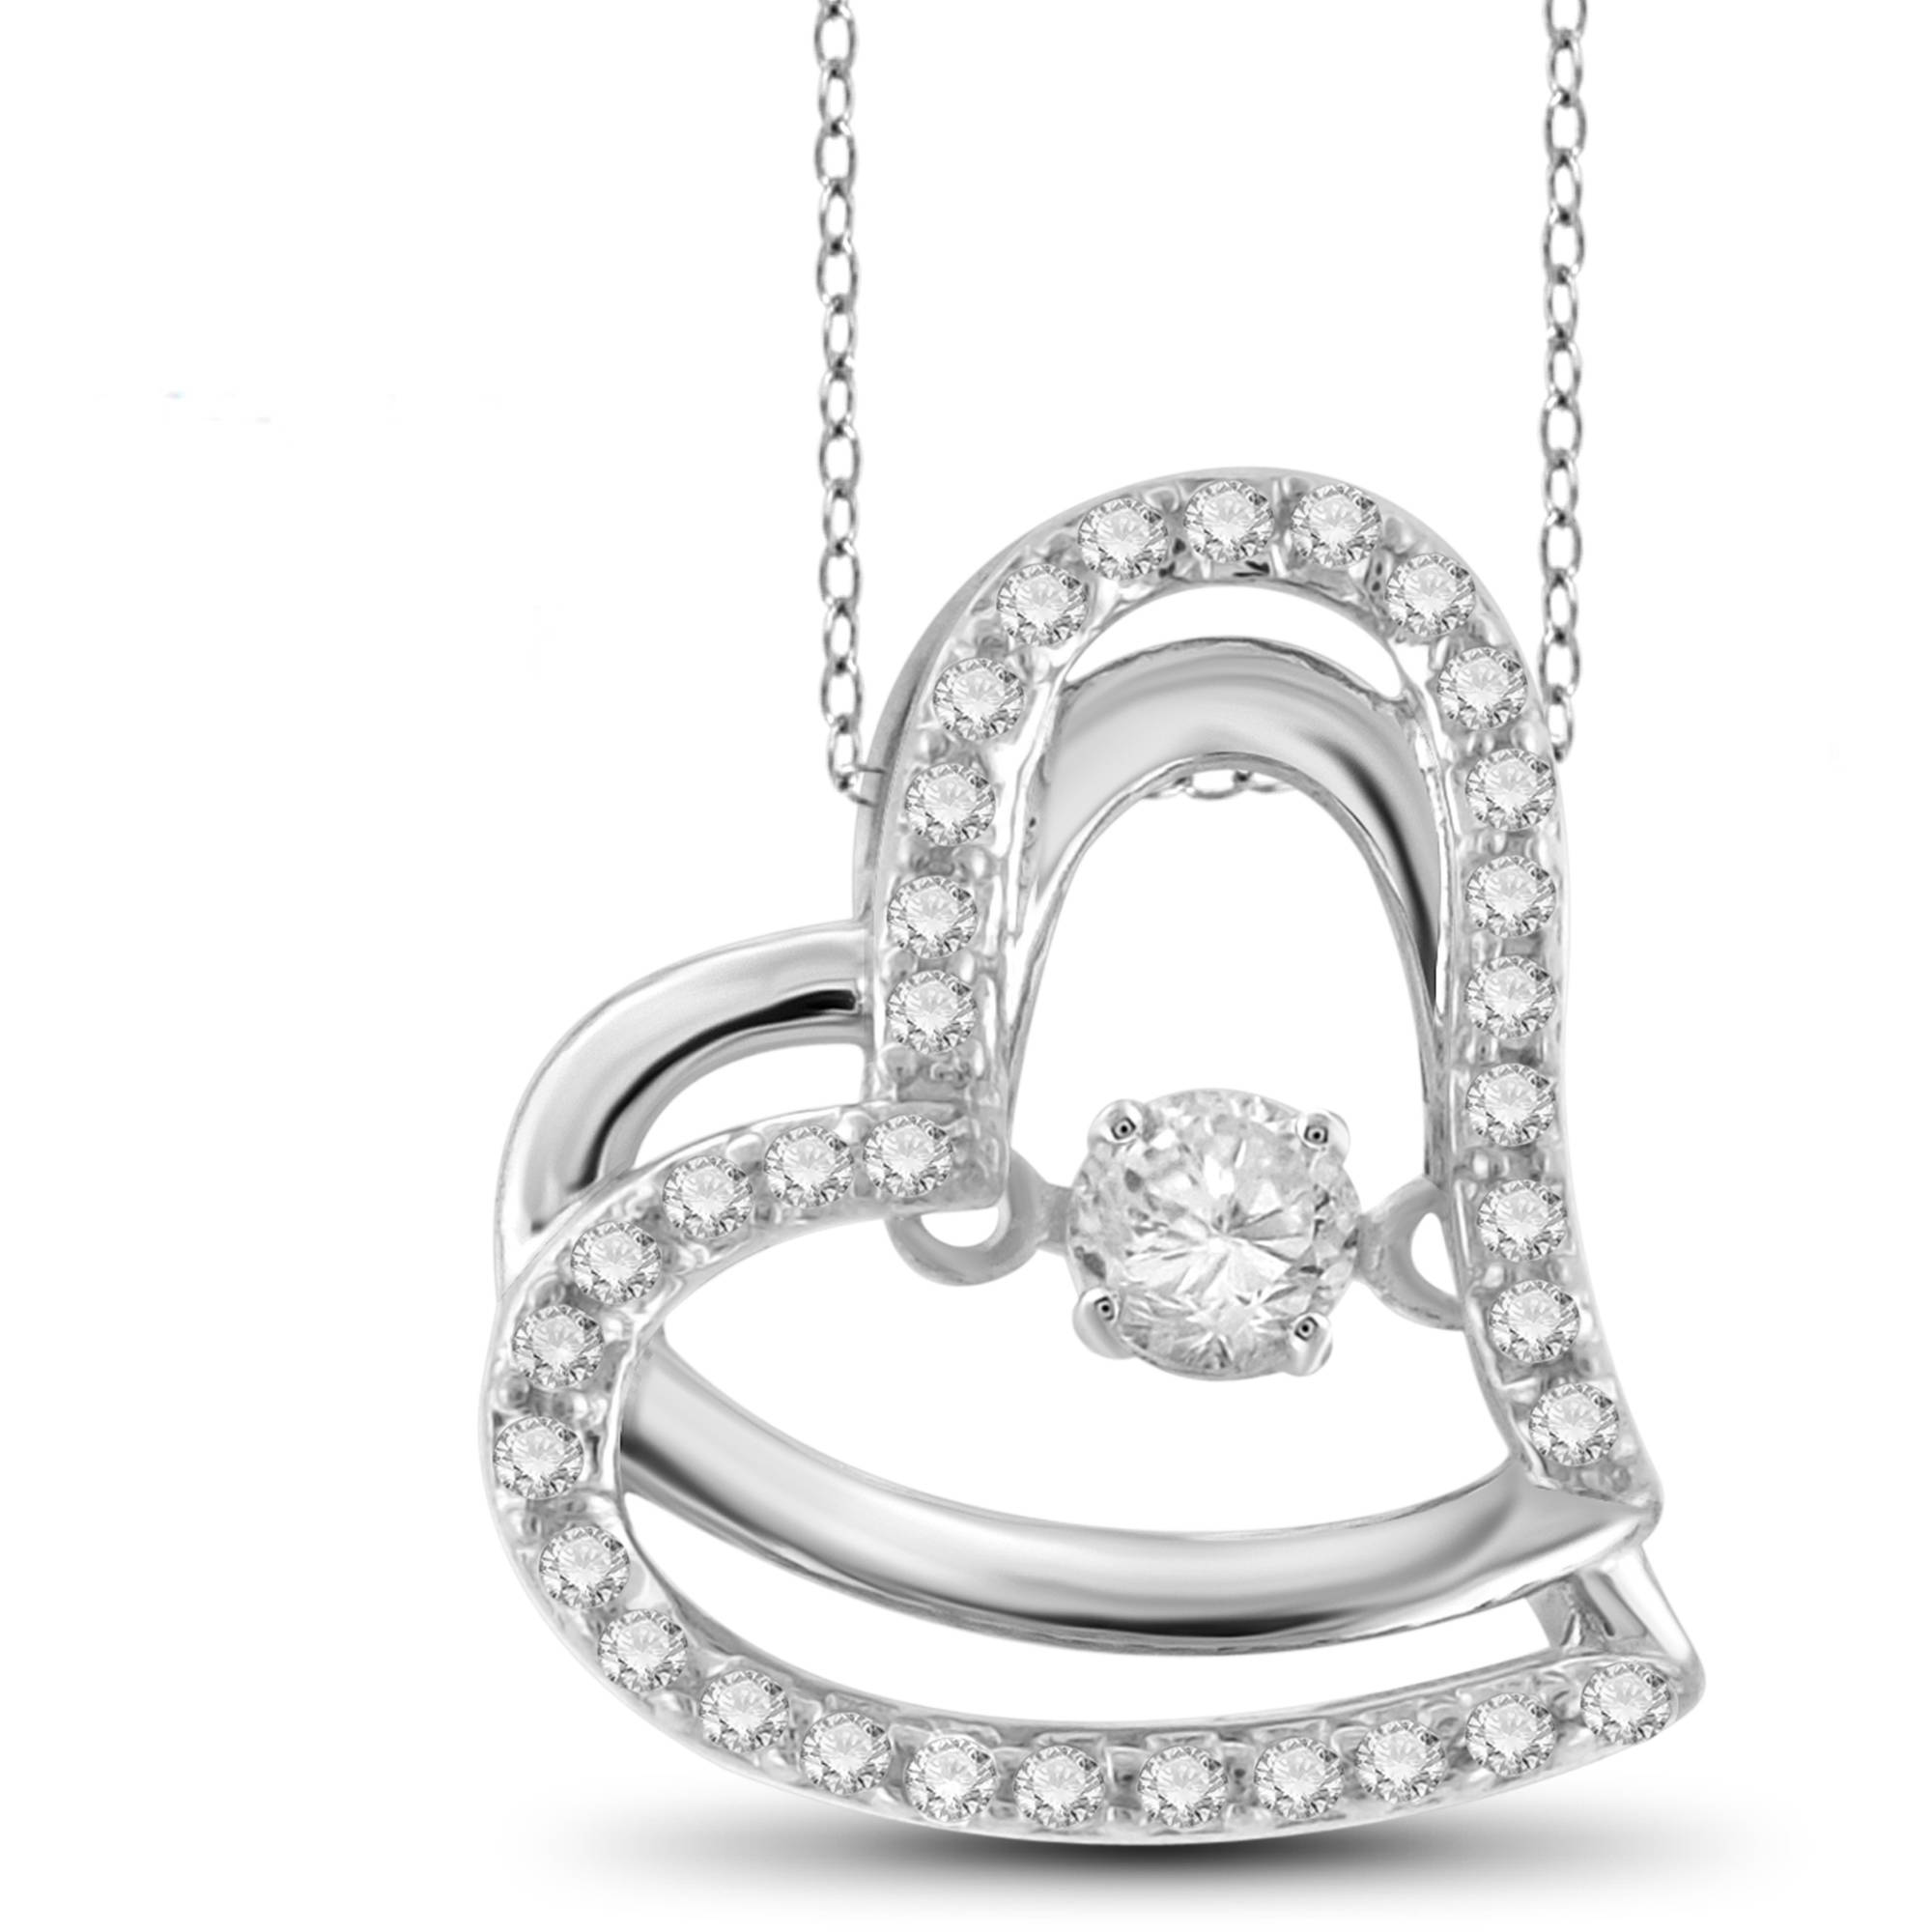 Diamonds in the Sky 1 4 Carat T.W. White Diamond 10kt White Gold Fancy Heart Pendant by Diamonds in the Sky